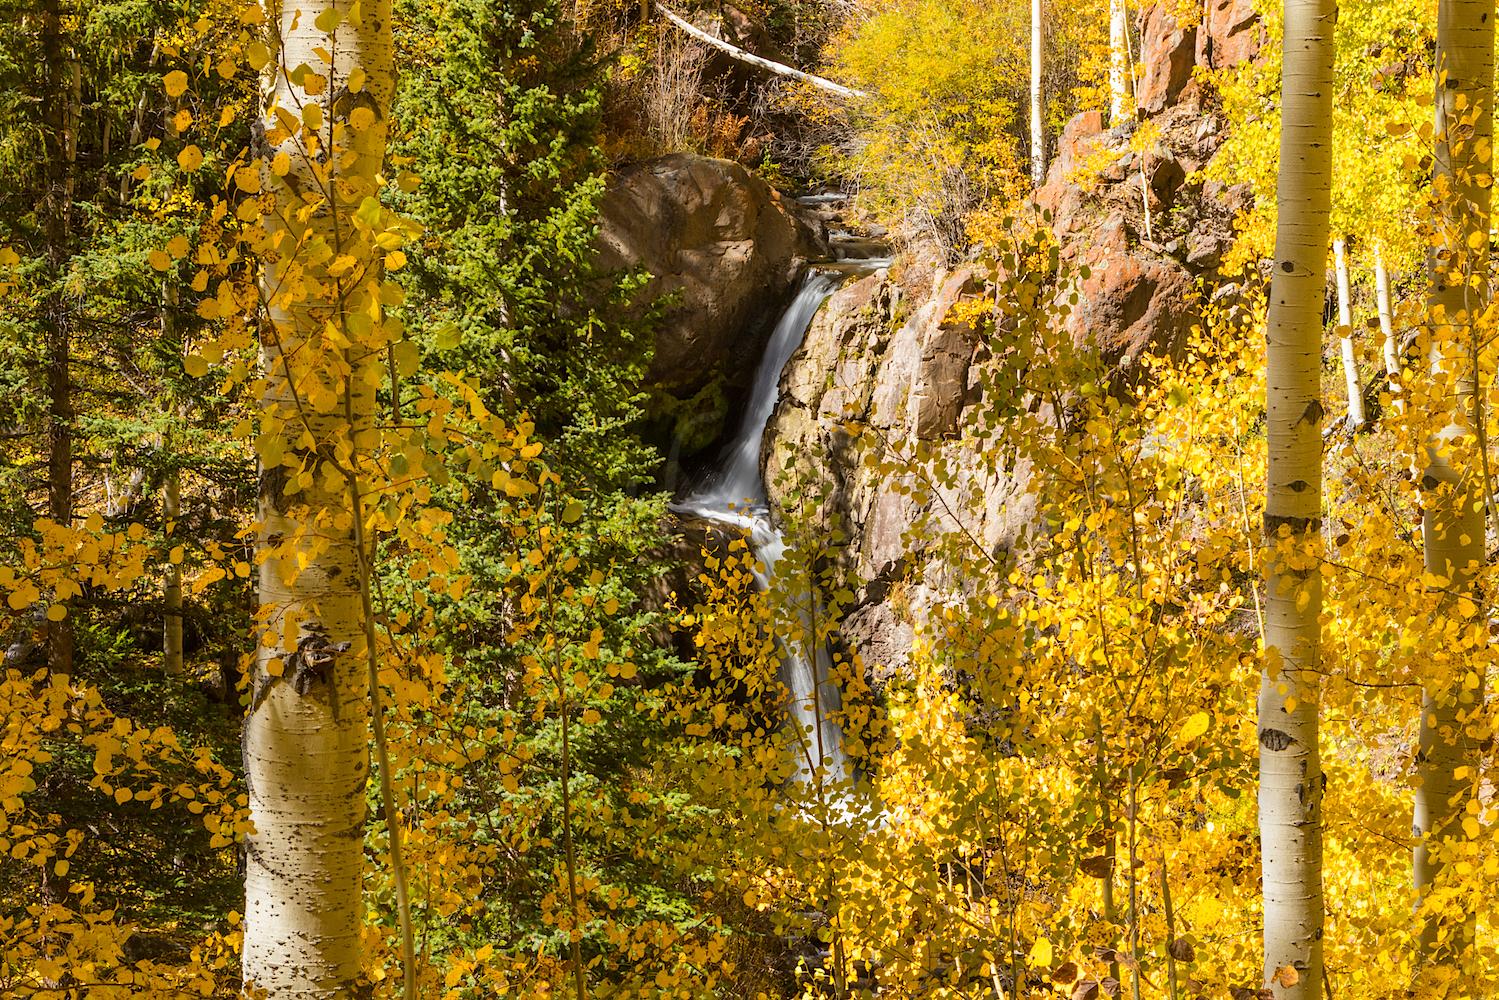 Nellie Creek Falls, Image # 5457